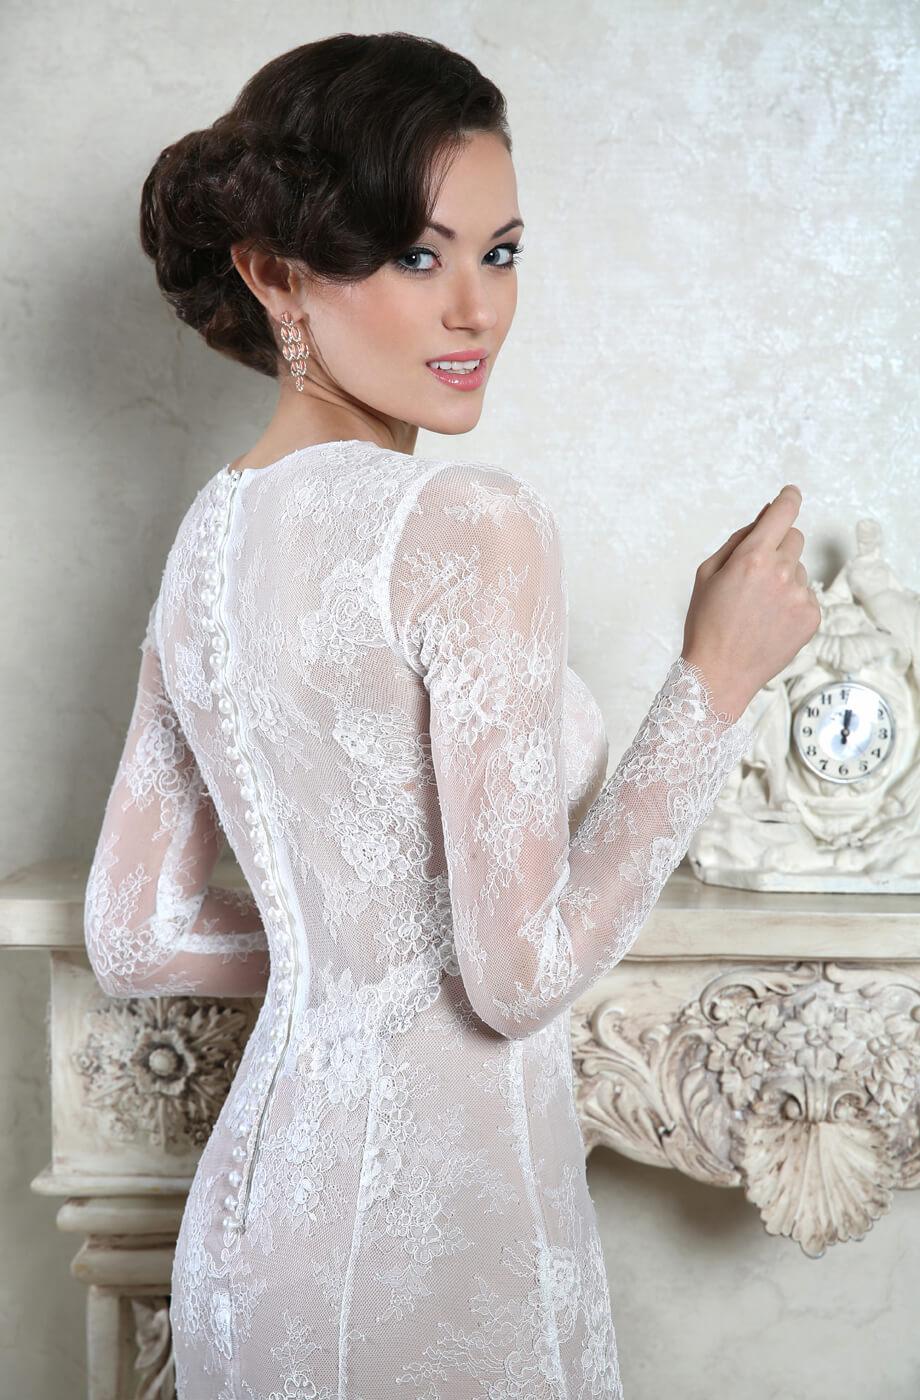 robe mariee dentelle avec les manches